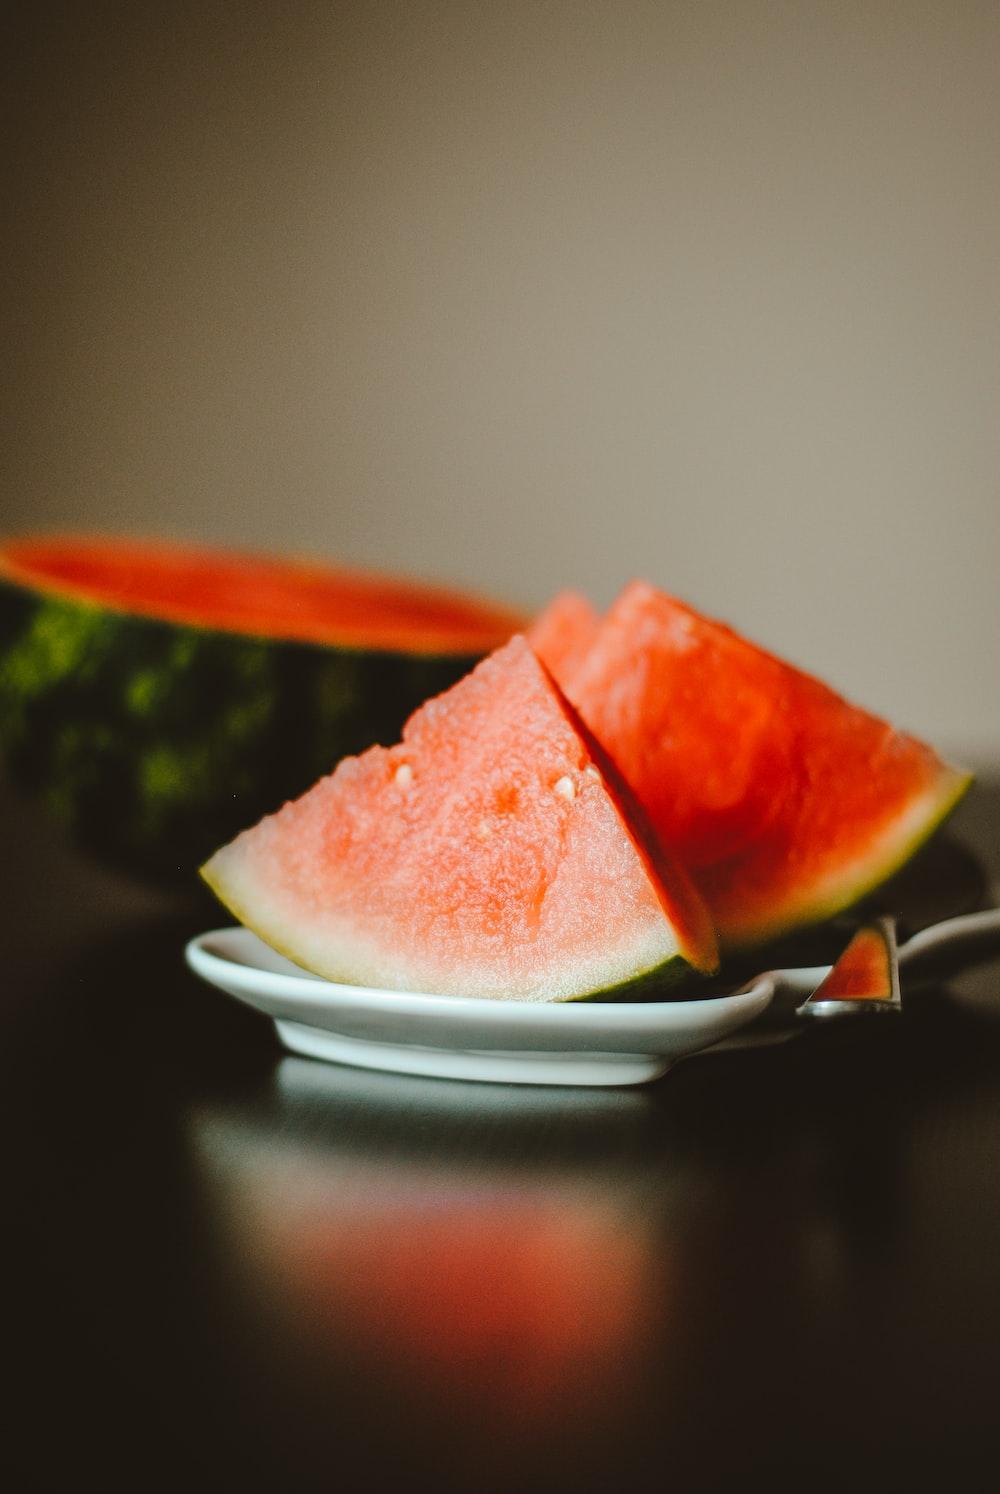 watermelon slice on white ceramic plate